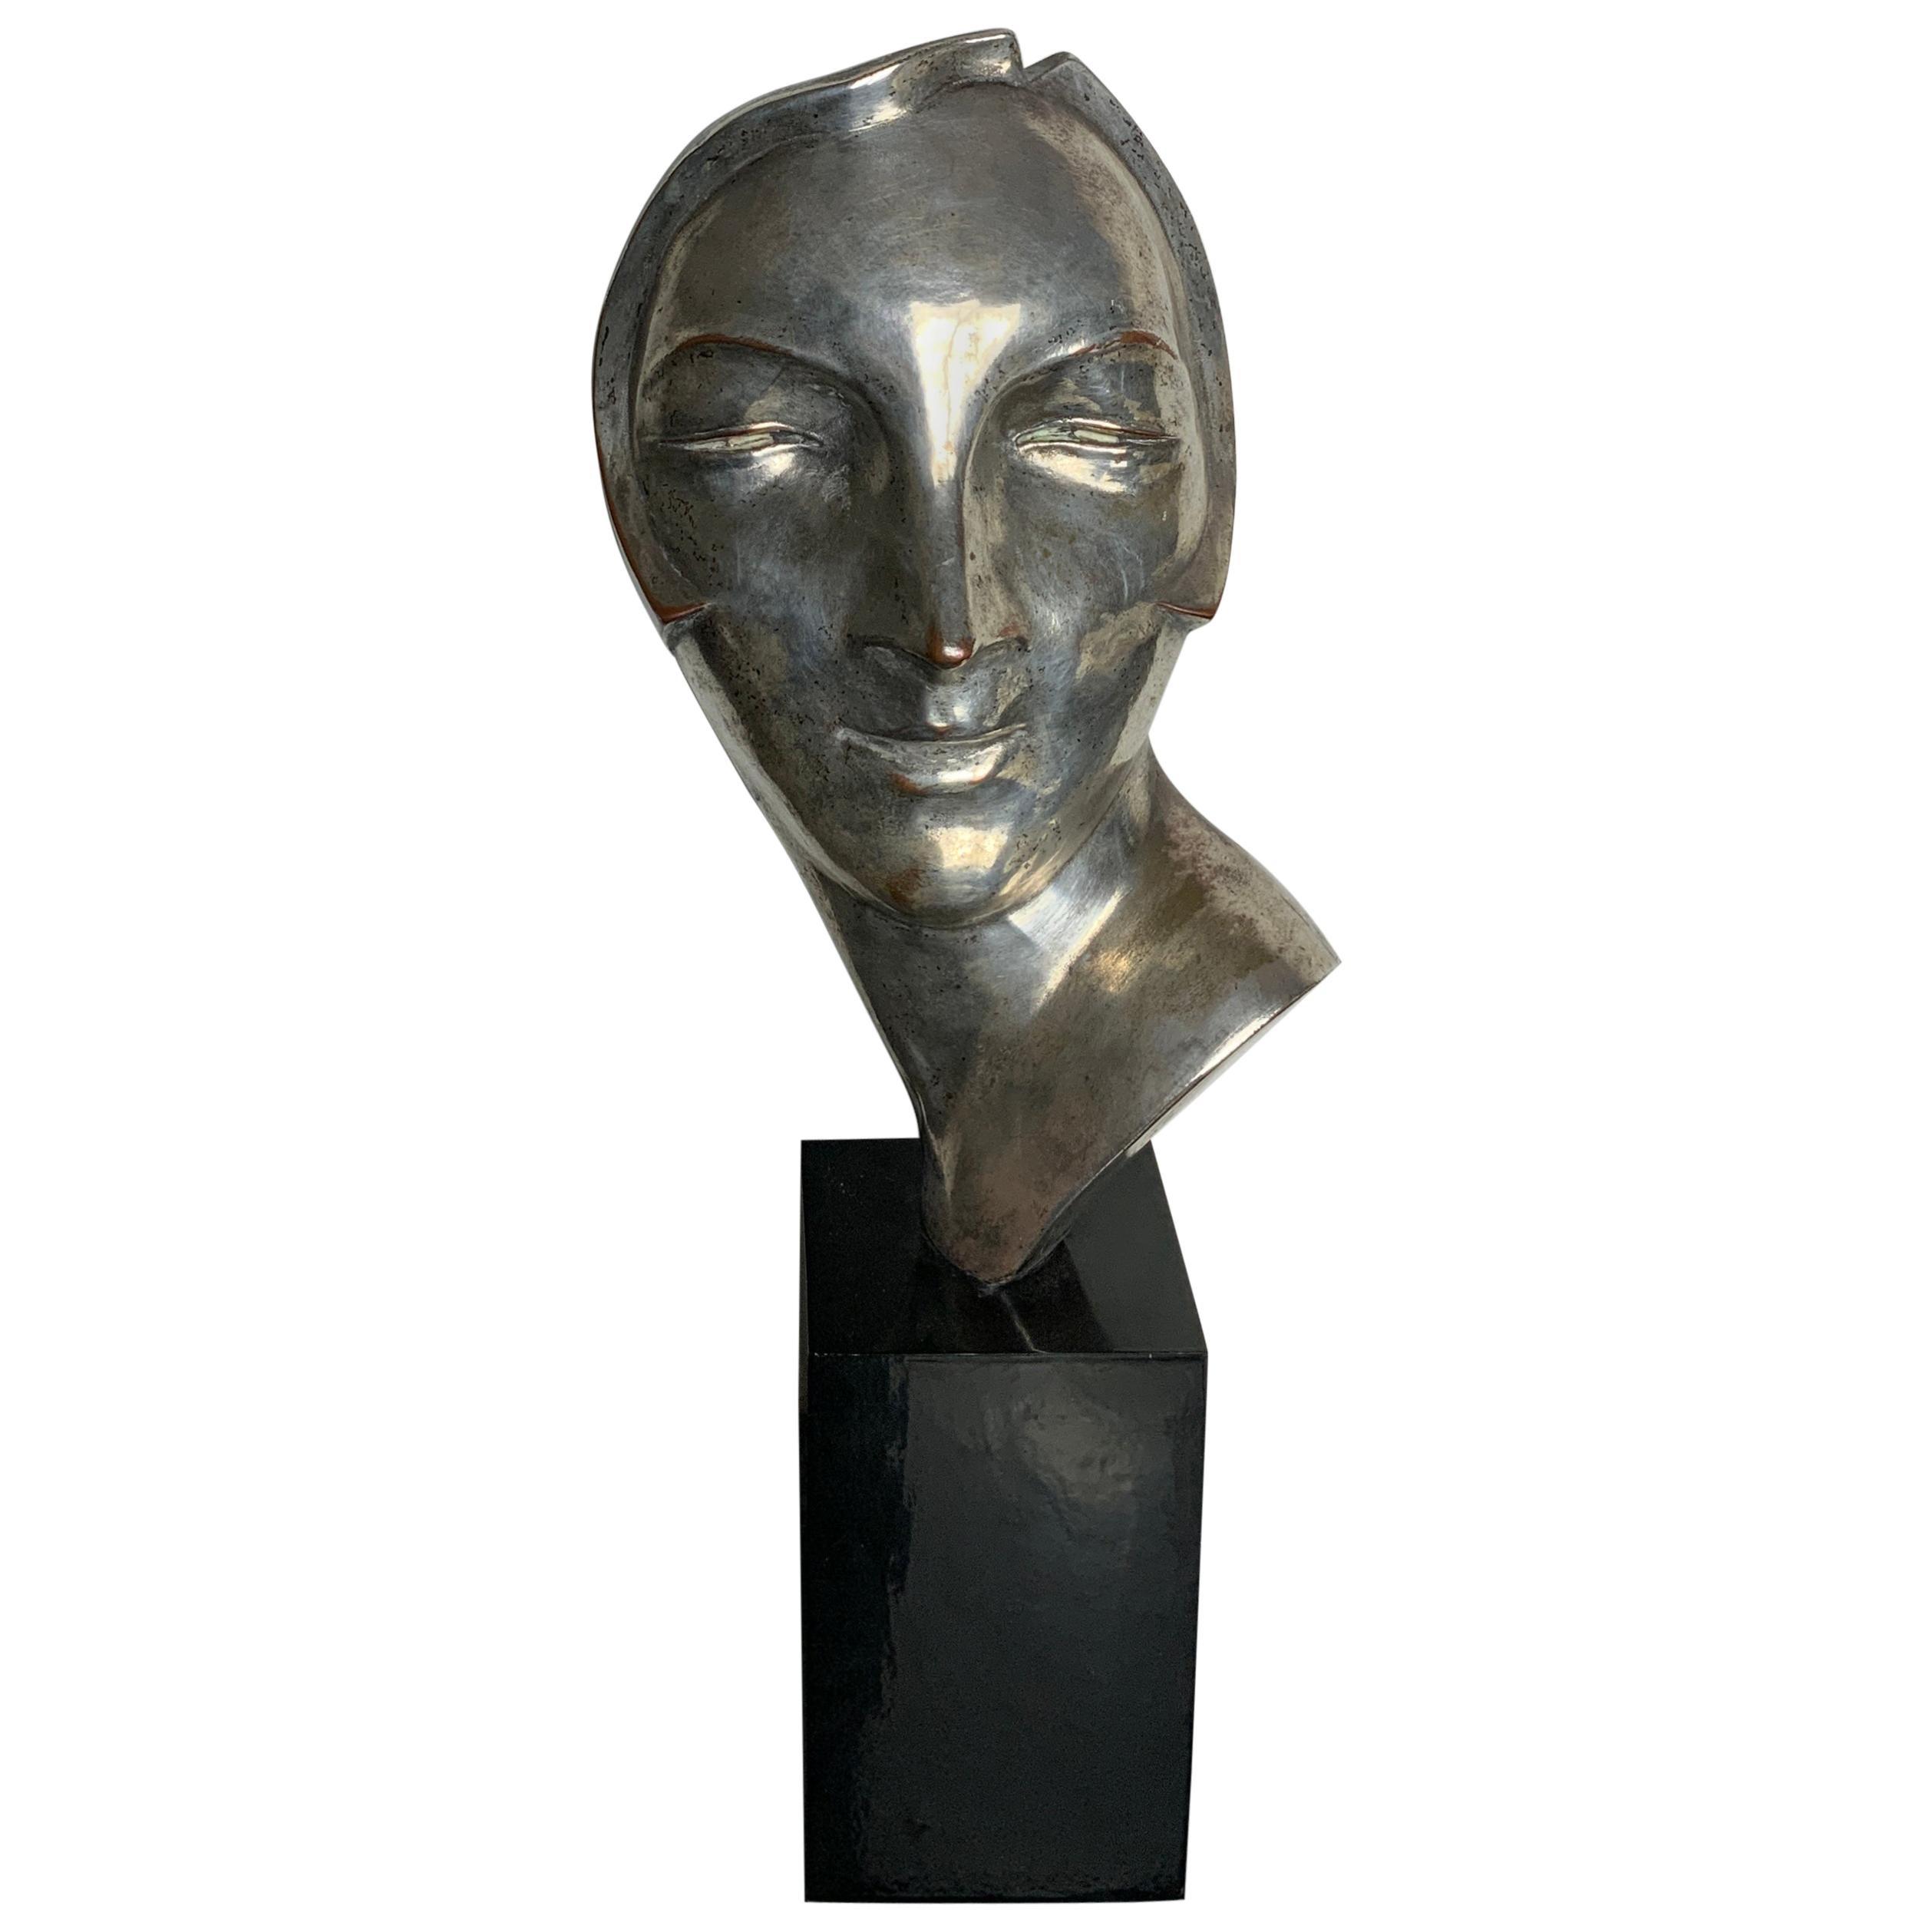 Art Deco Sculpture Guido Cacciapuoti